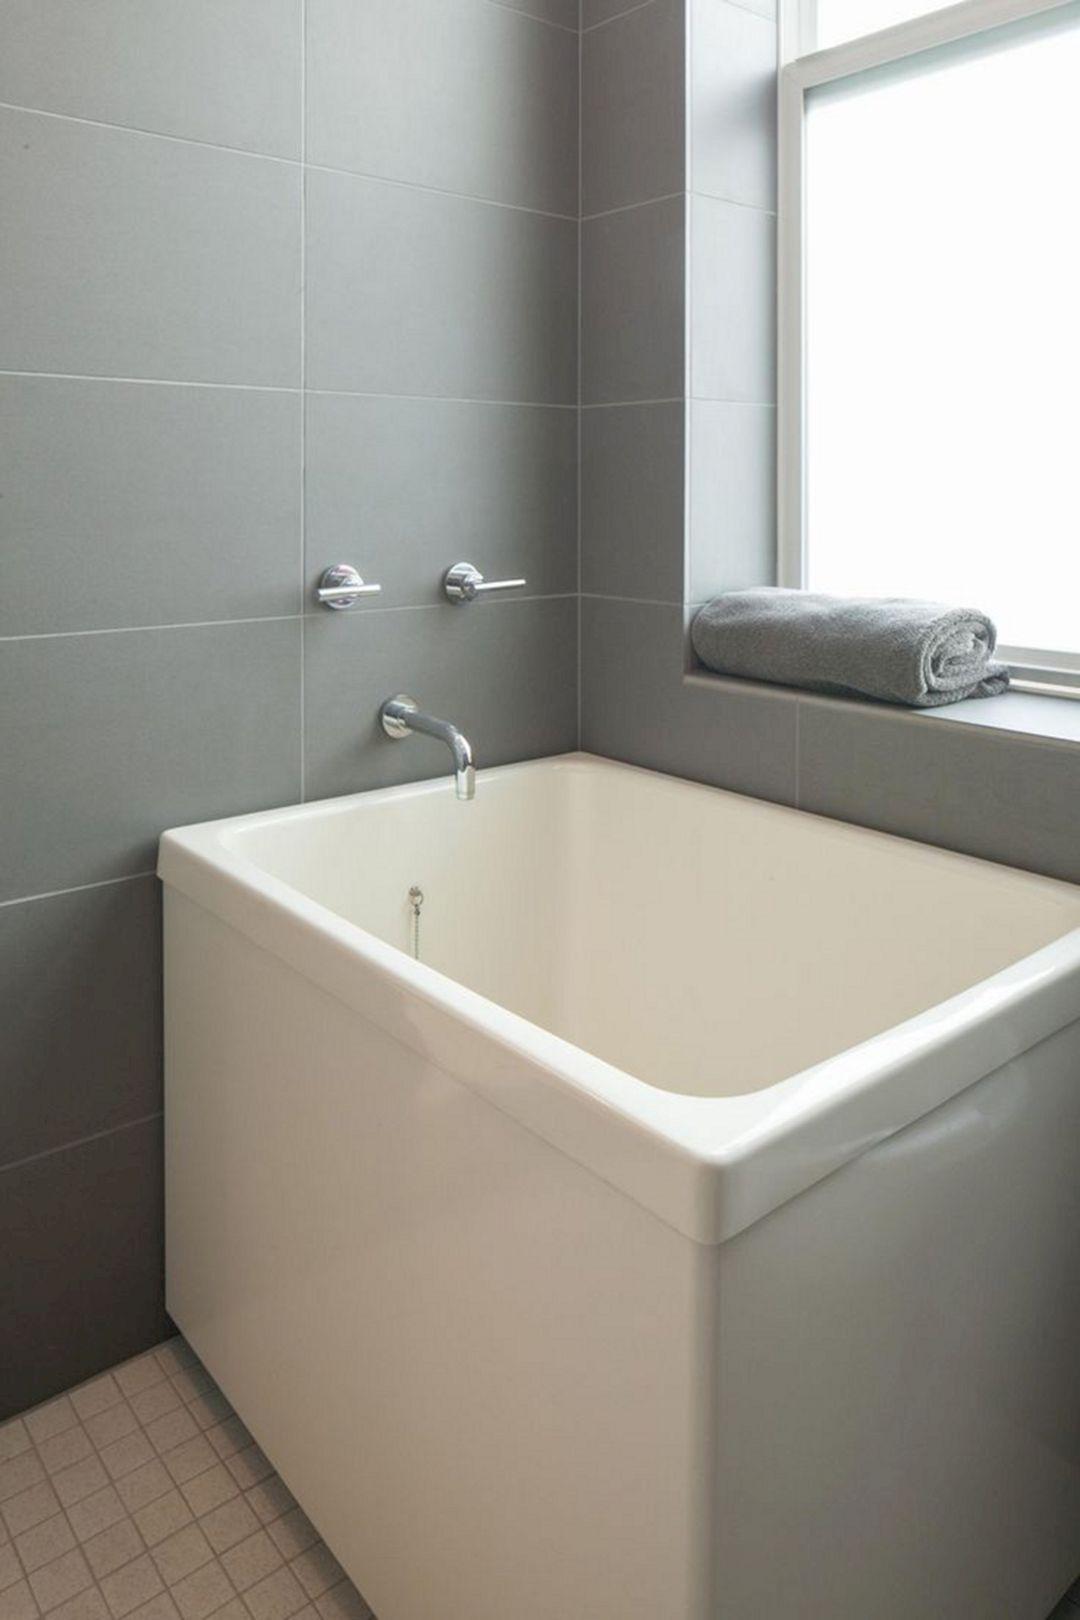 Top 25 Comfortable Japanese Soaking Tub Ideas For Relaxation After Got Hard Work Https Decoredo Com Japanese Soaking Tubs Bathtub Shower Combo Small Bathtub